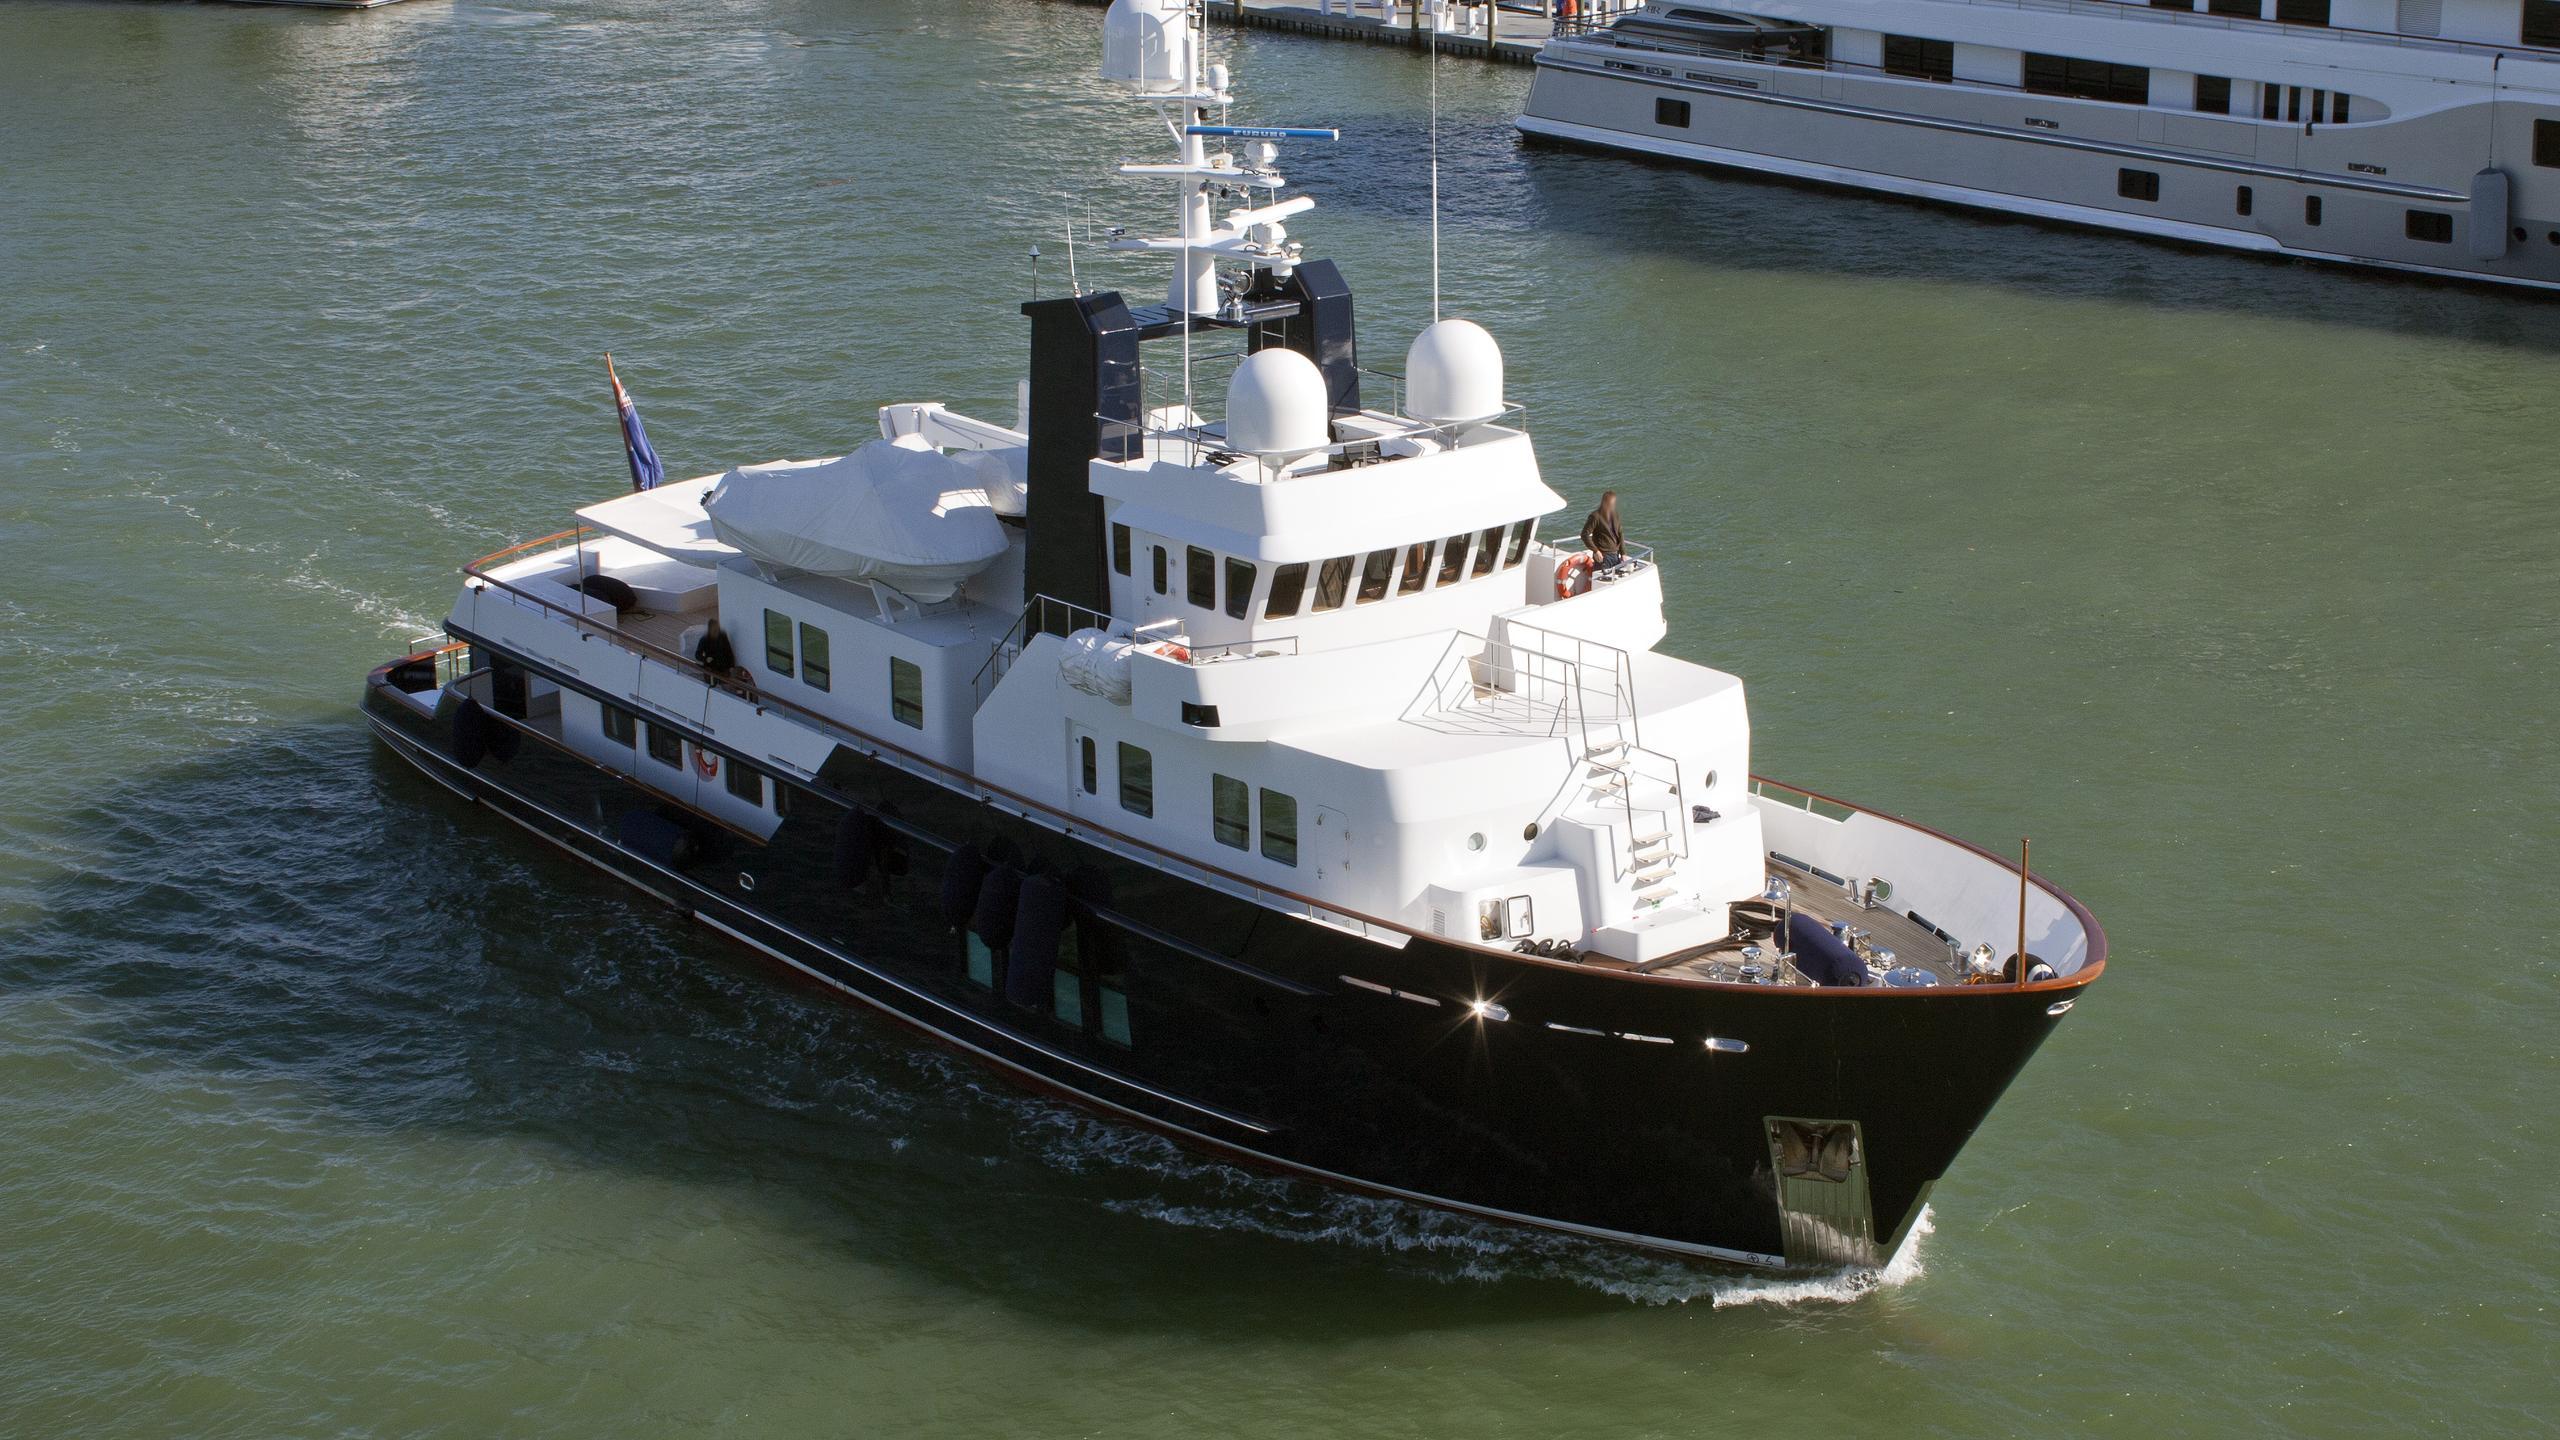 husky-explorer-rh3-motor-yacht-rmk-bradford-120-2003-37m-aerial